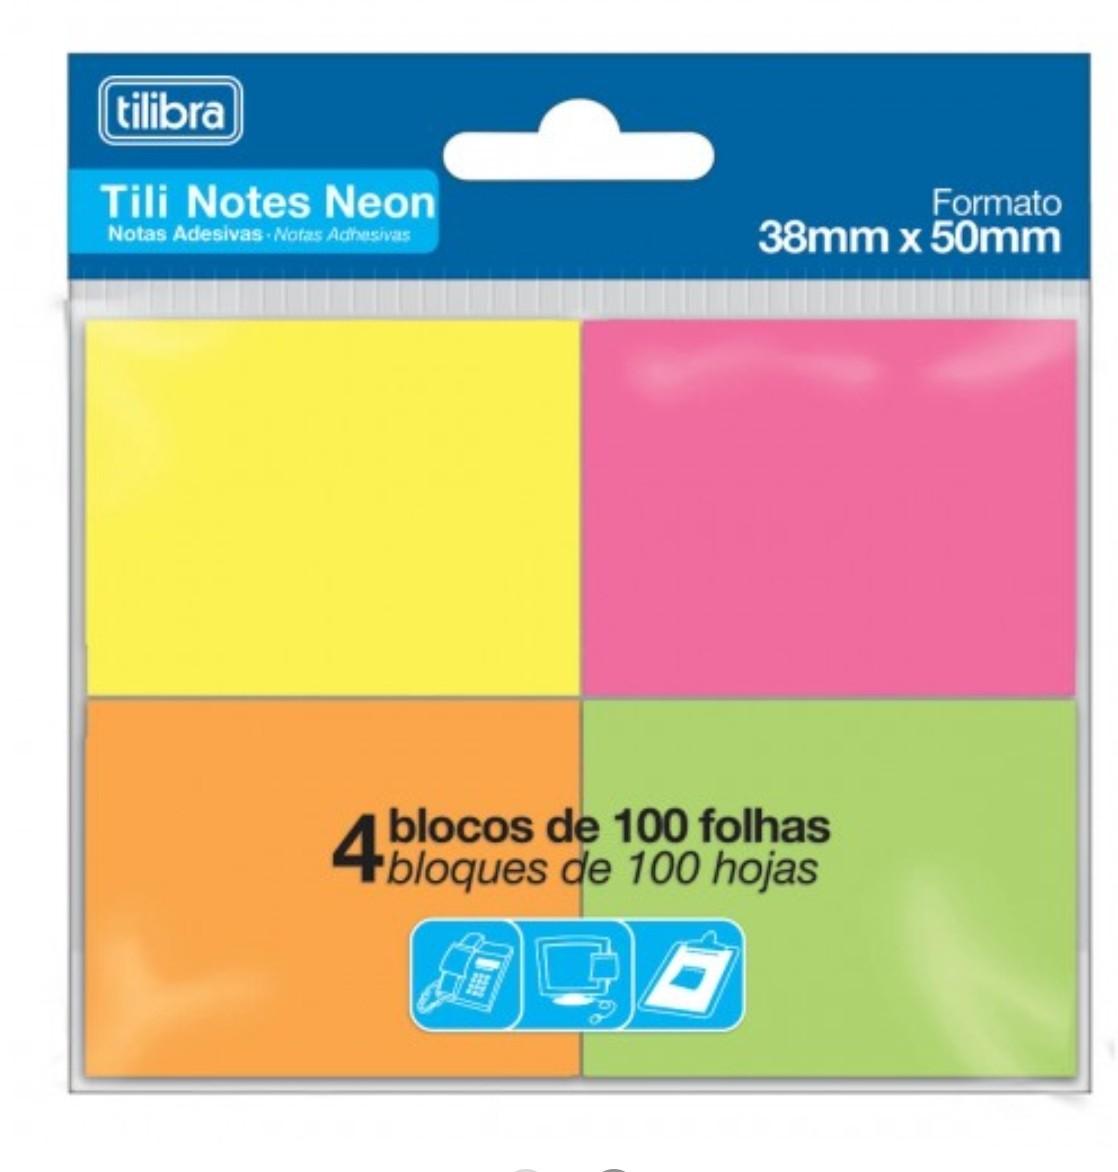 Tili Notes Neom 4 Blocos